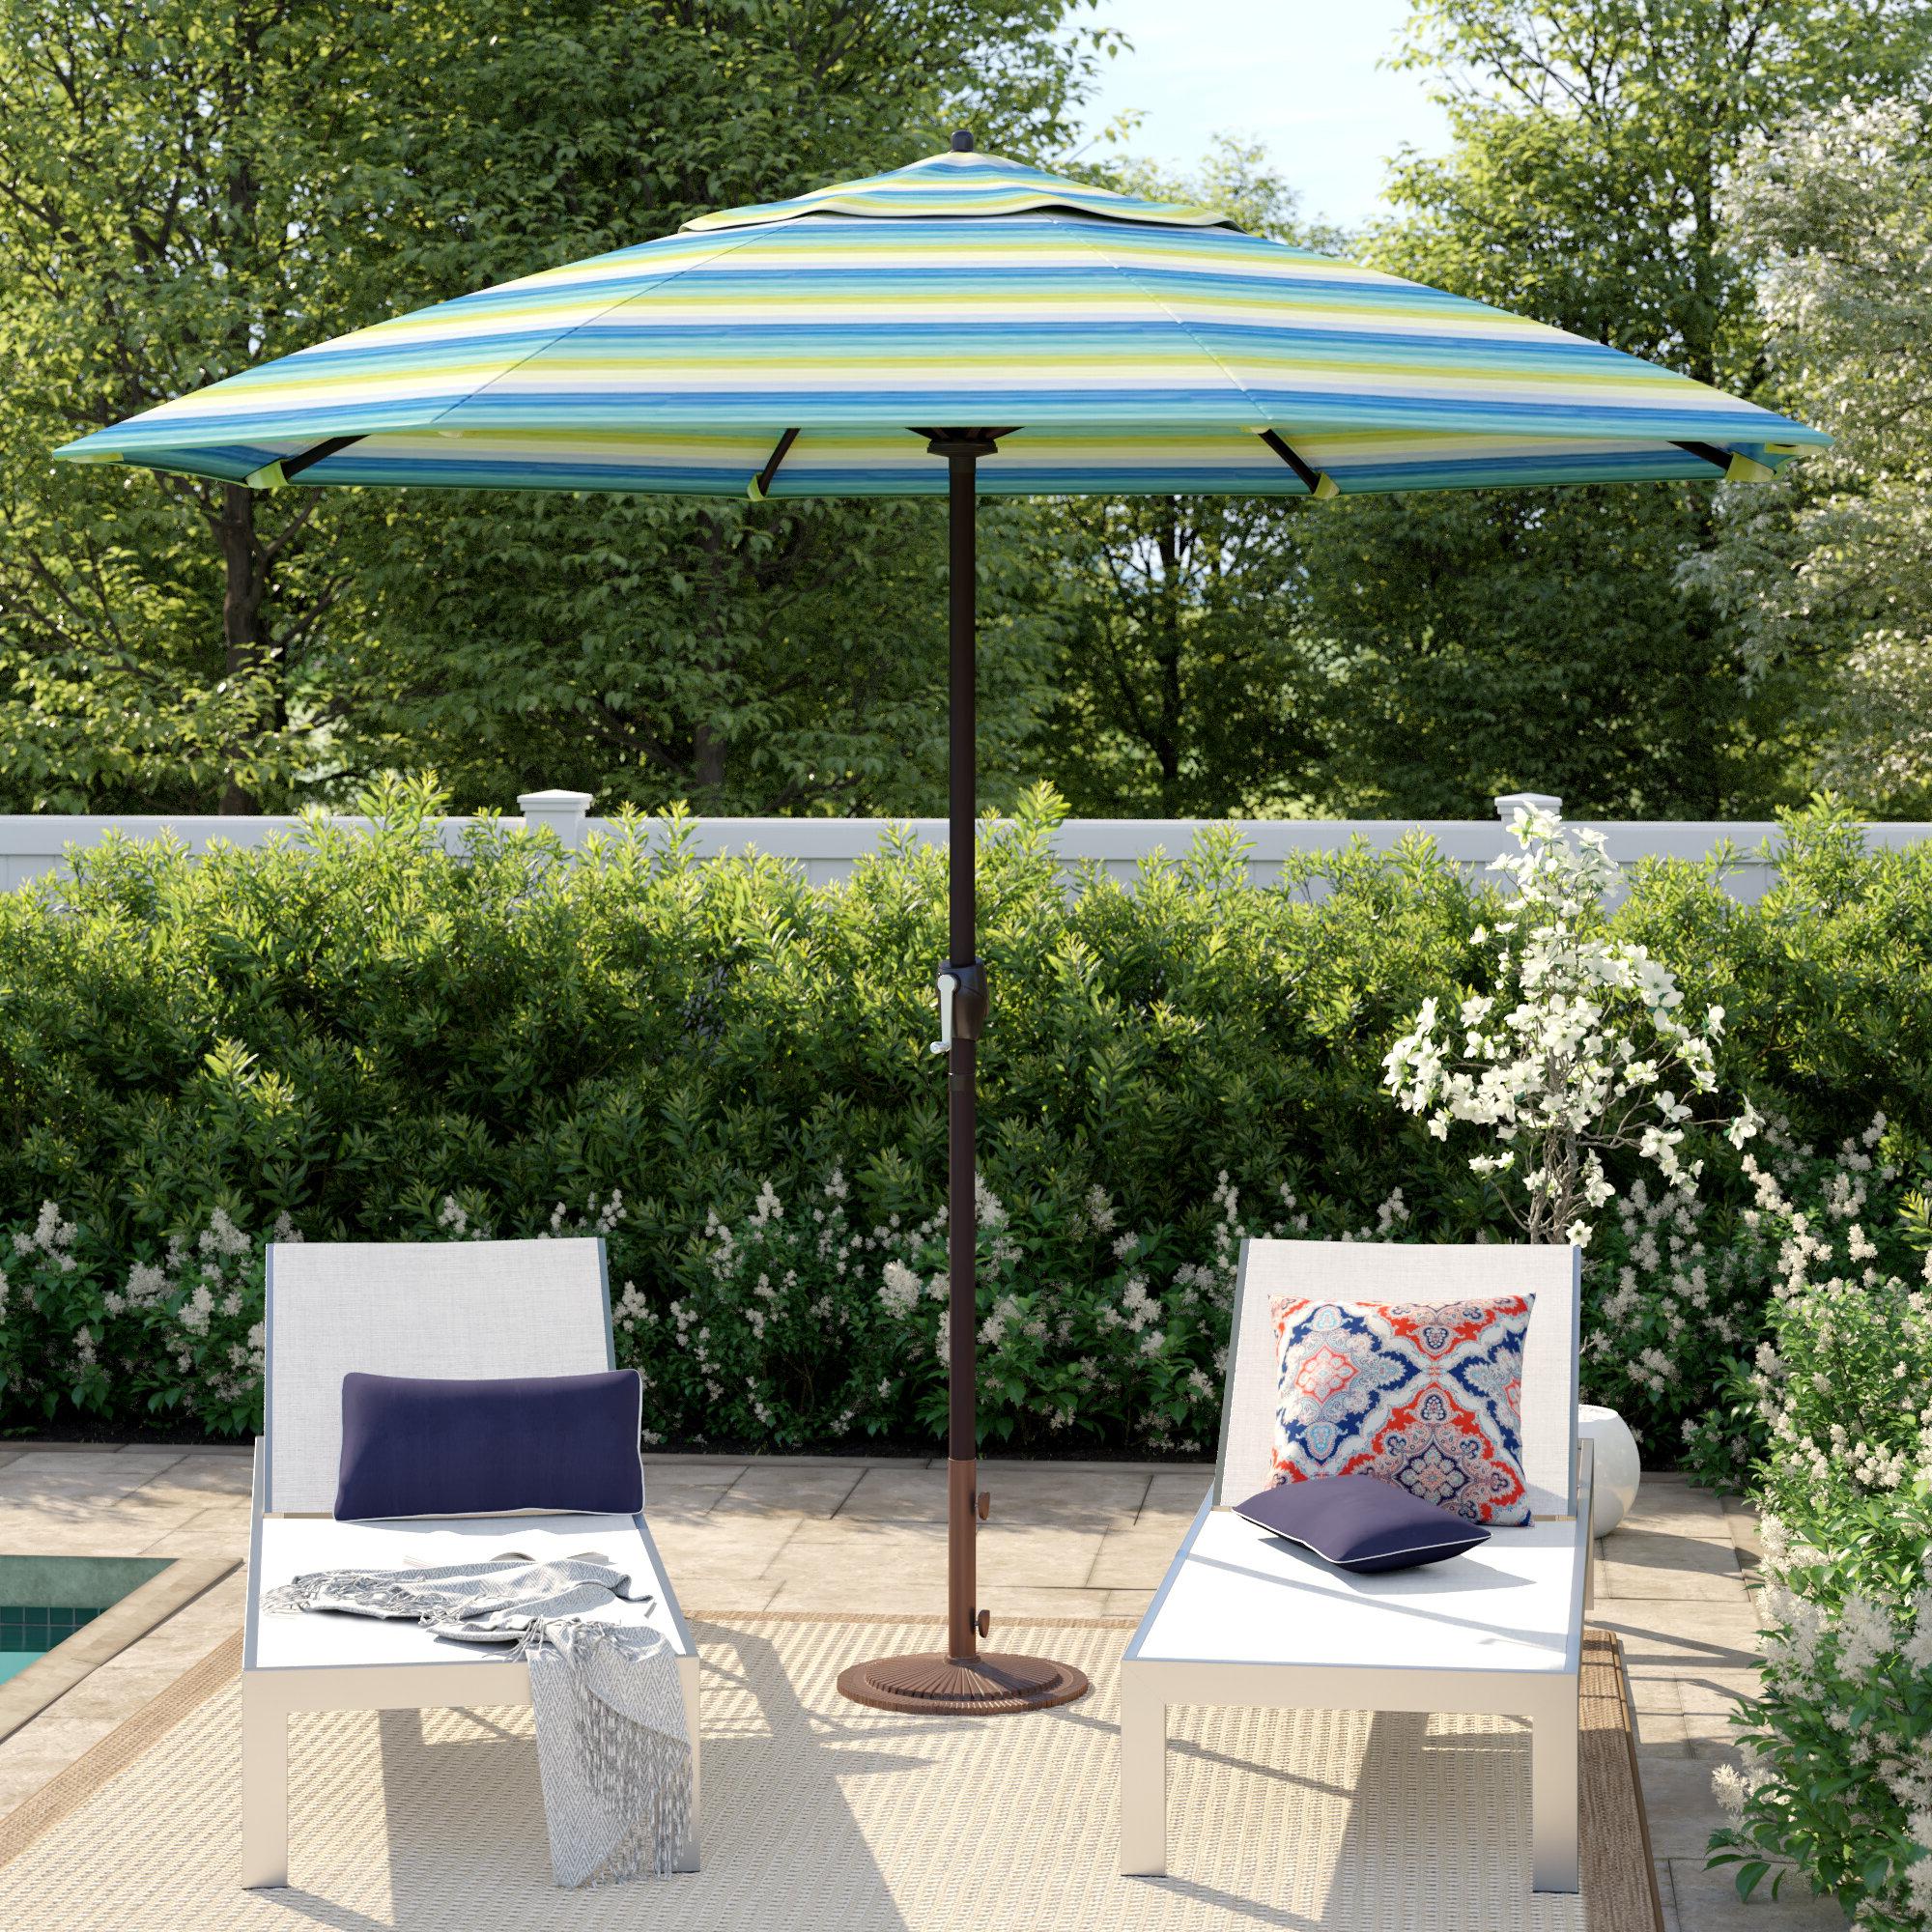 Cardine 9' Market Sunbrella Umbrella With Most Popular Flitwick Market Umbrellas (View 4 of 20)